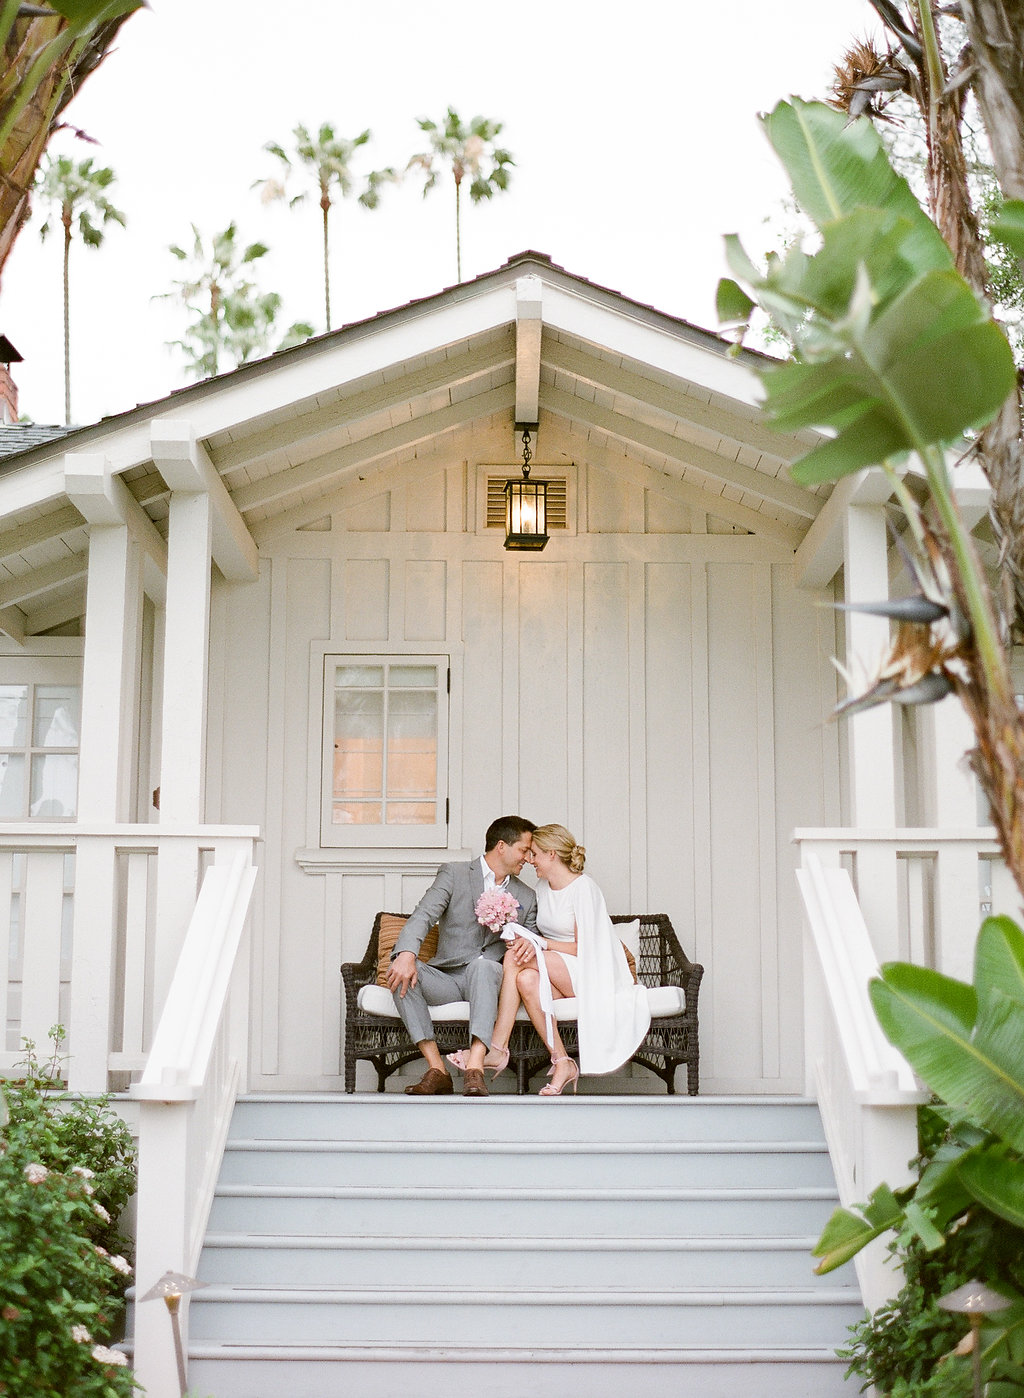 santa-barbara-elopement-wedding-planning-planner-coordinator-day-of-week-small-wedding-el-encanto-lily-pond-pink-kids-garden-riviera-elope-design-estate-candle (16).jpg